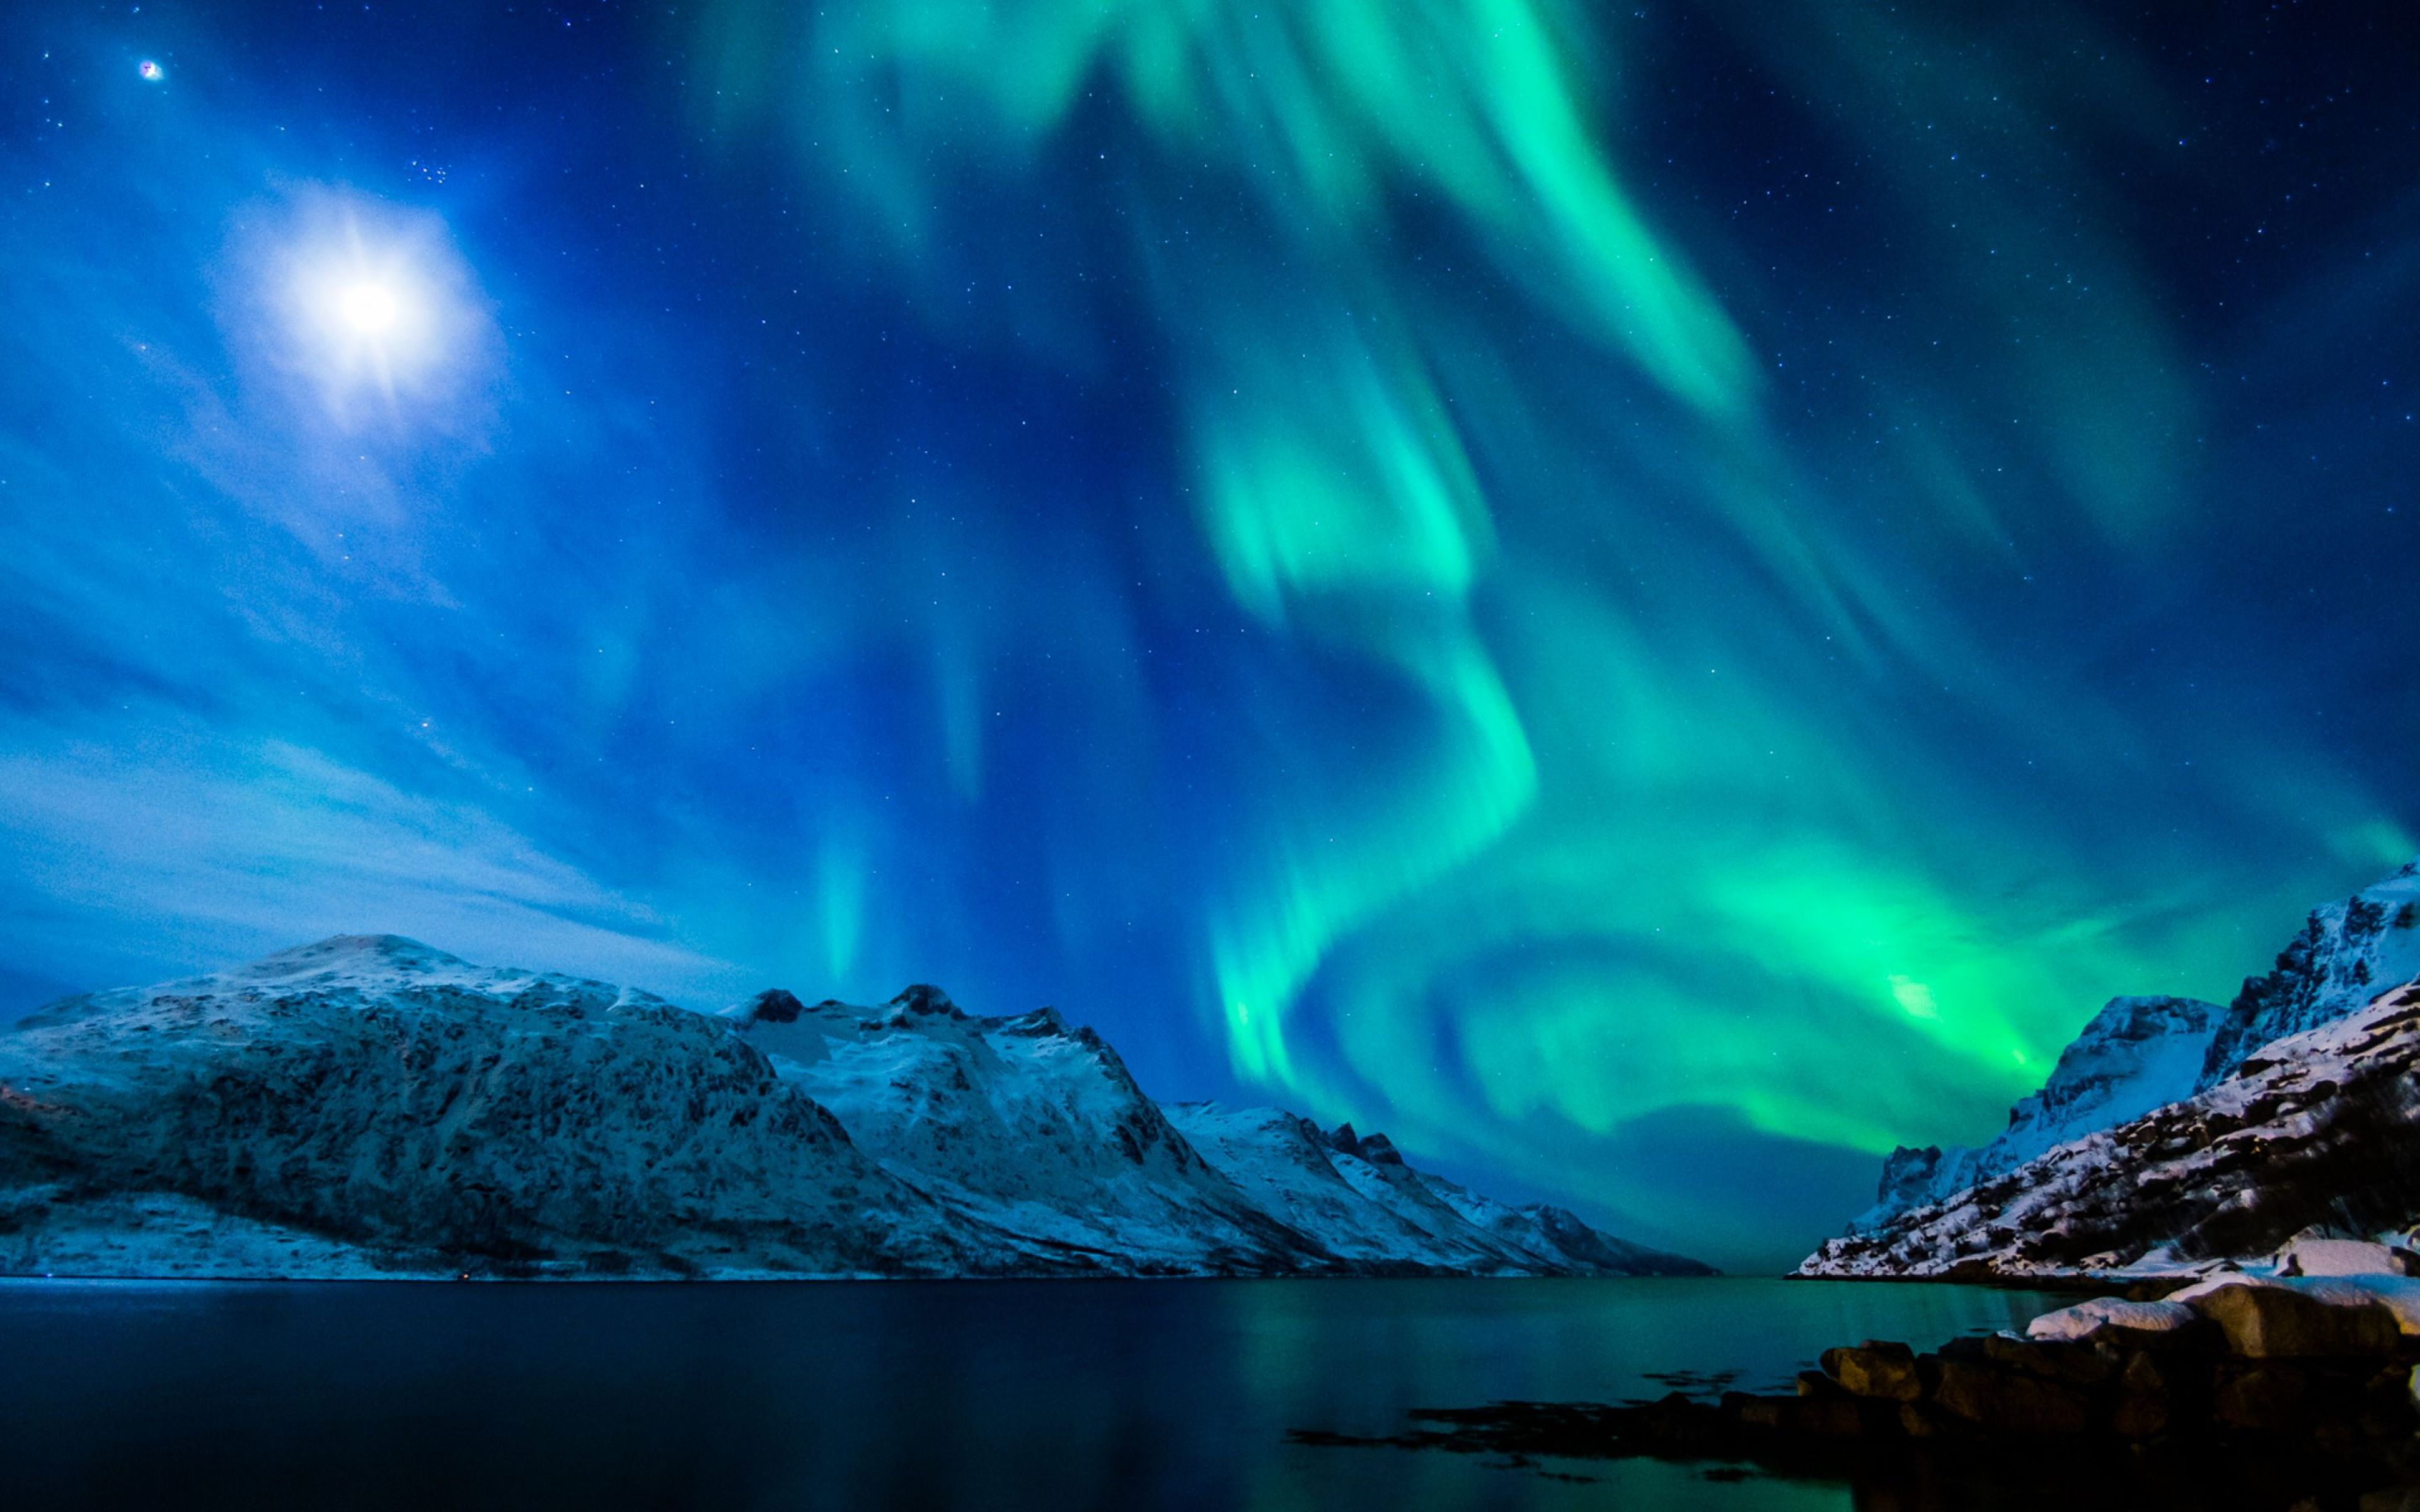 3840x2400 wallpaper northern lights aurora borealis uk 2015 sth rh pinterest com